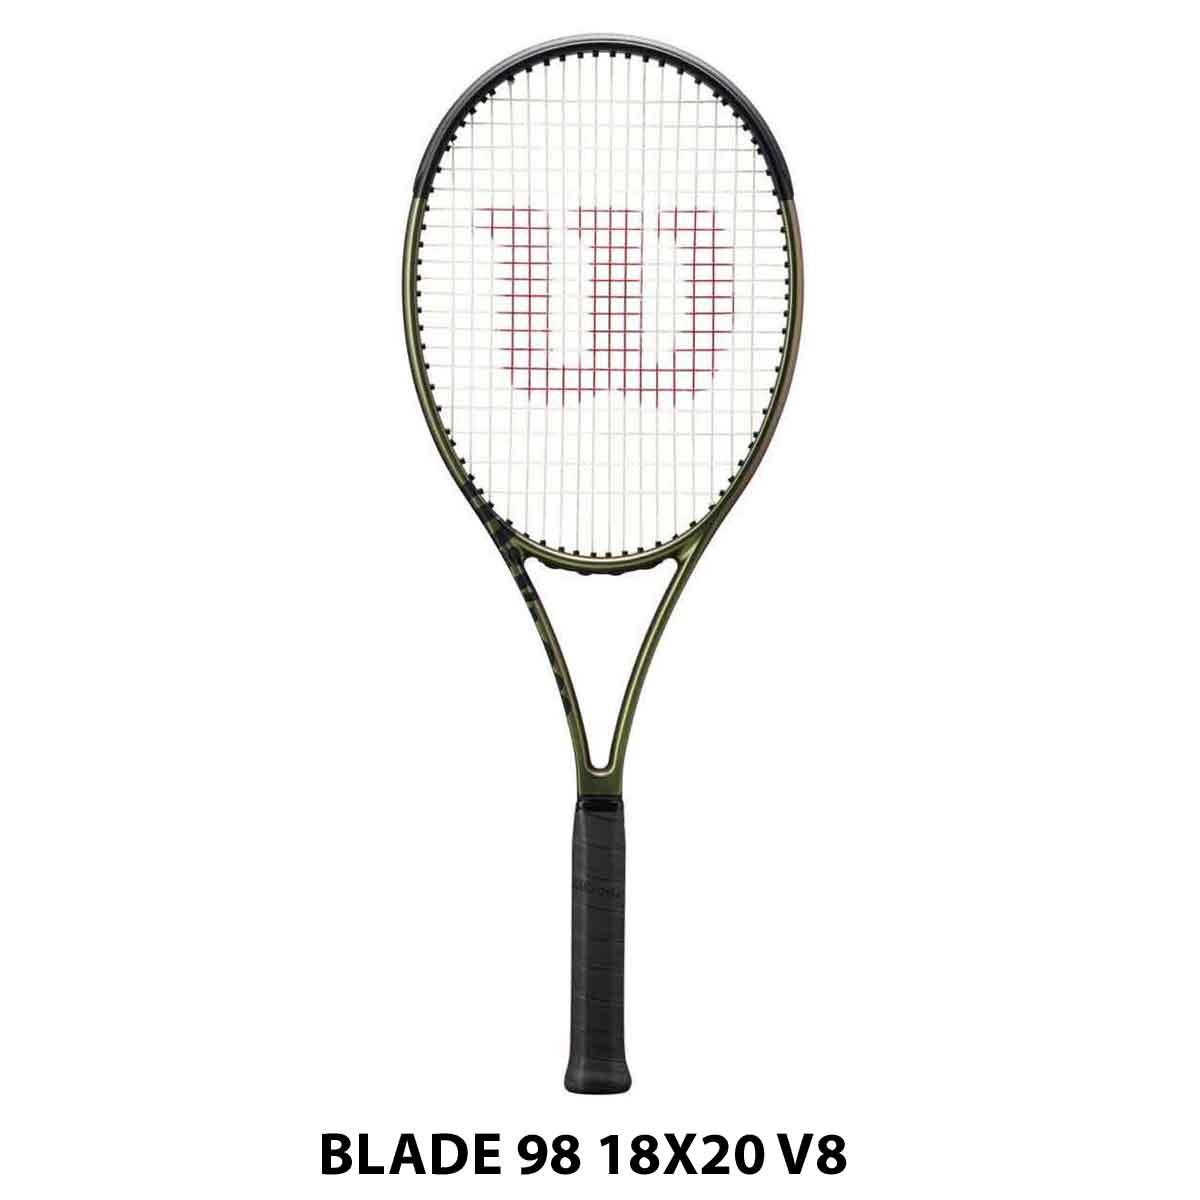 WILSON BLADE 98 18X20 V8